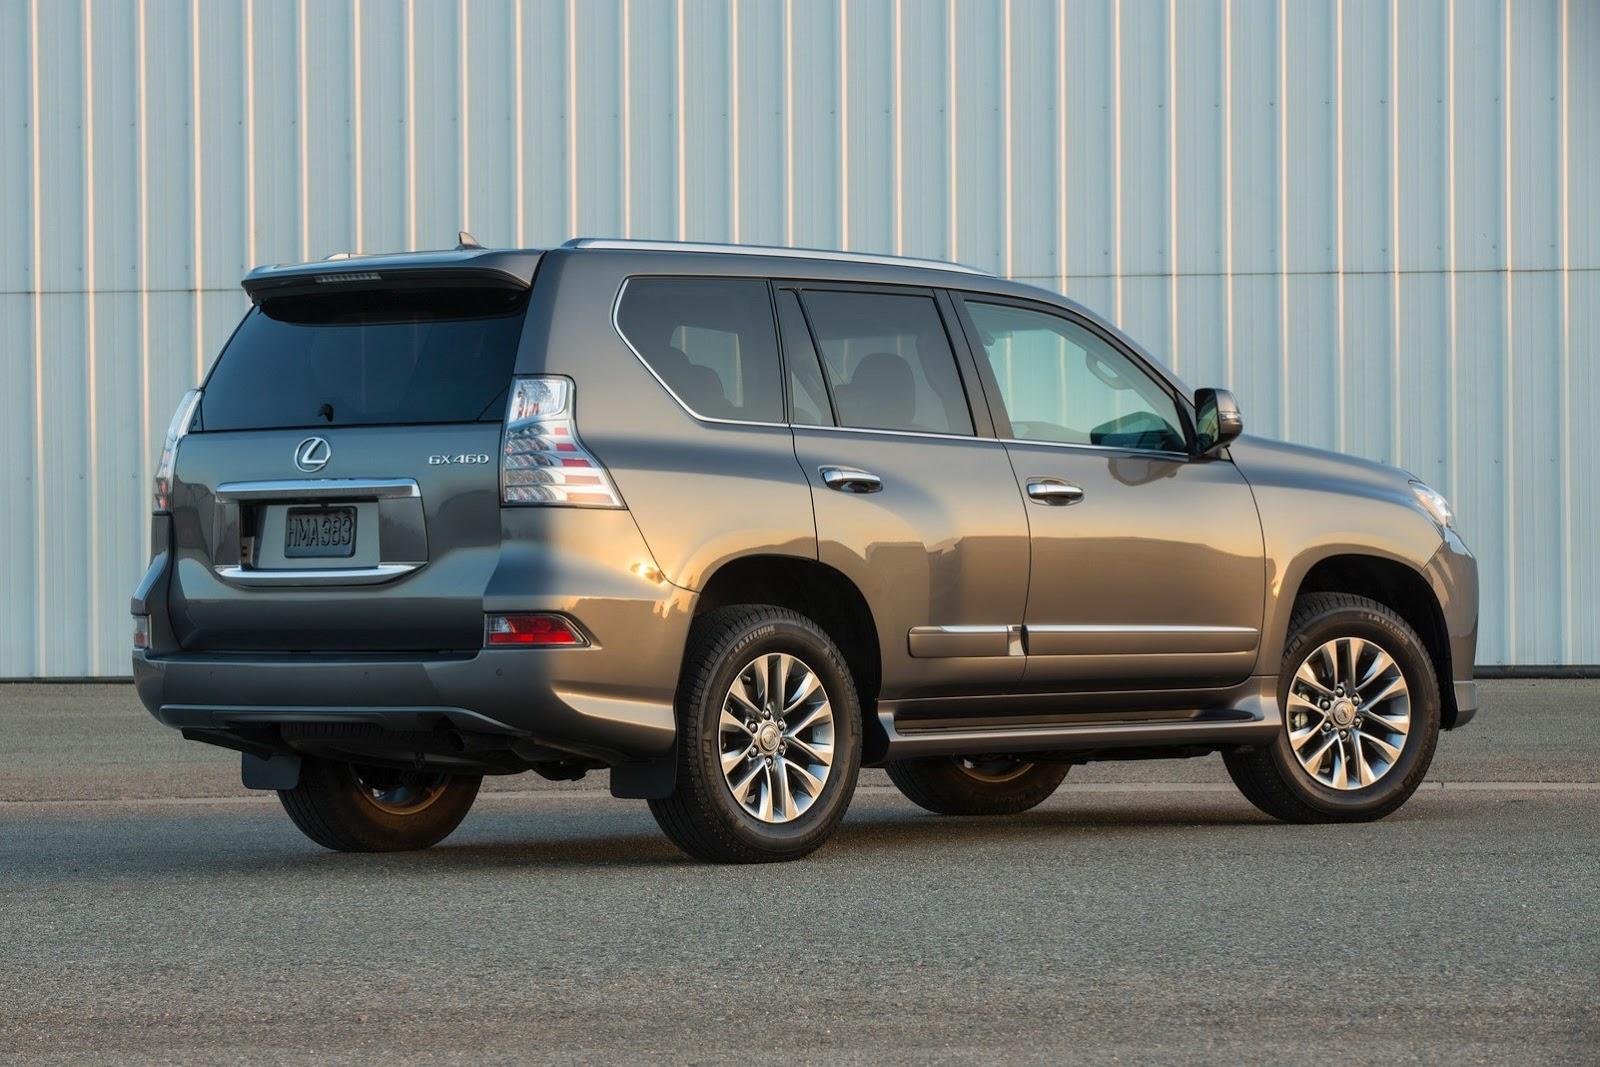 2009/13 - [Toyota/Lexus] Land Cruiser / GX Restylés - Page 4 2014-Lexus-GX-Facelift-3%252524%25255B2%25255D